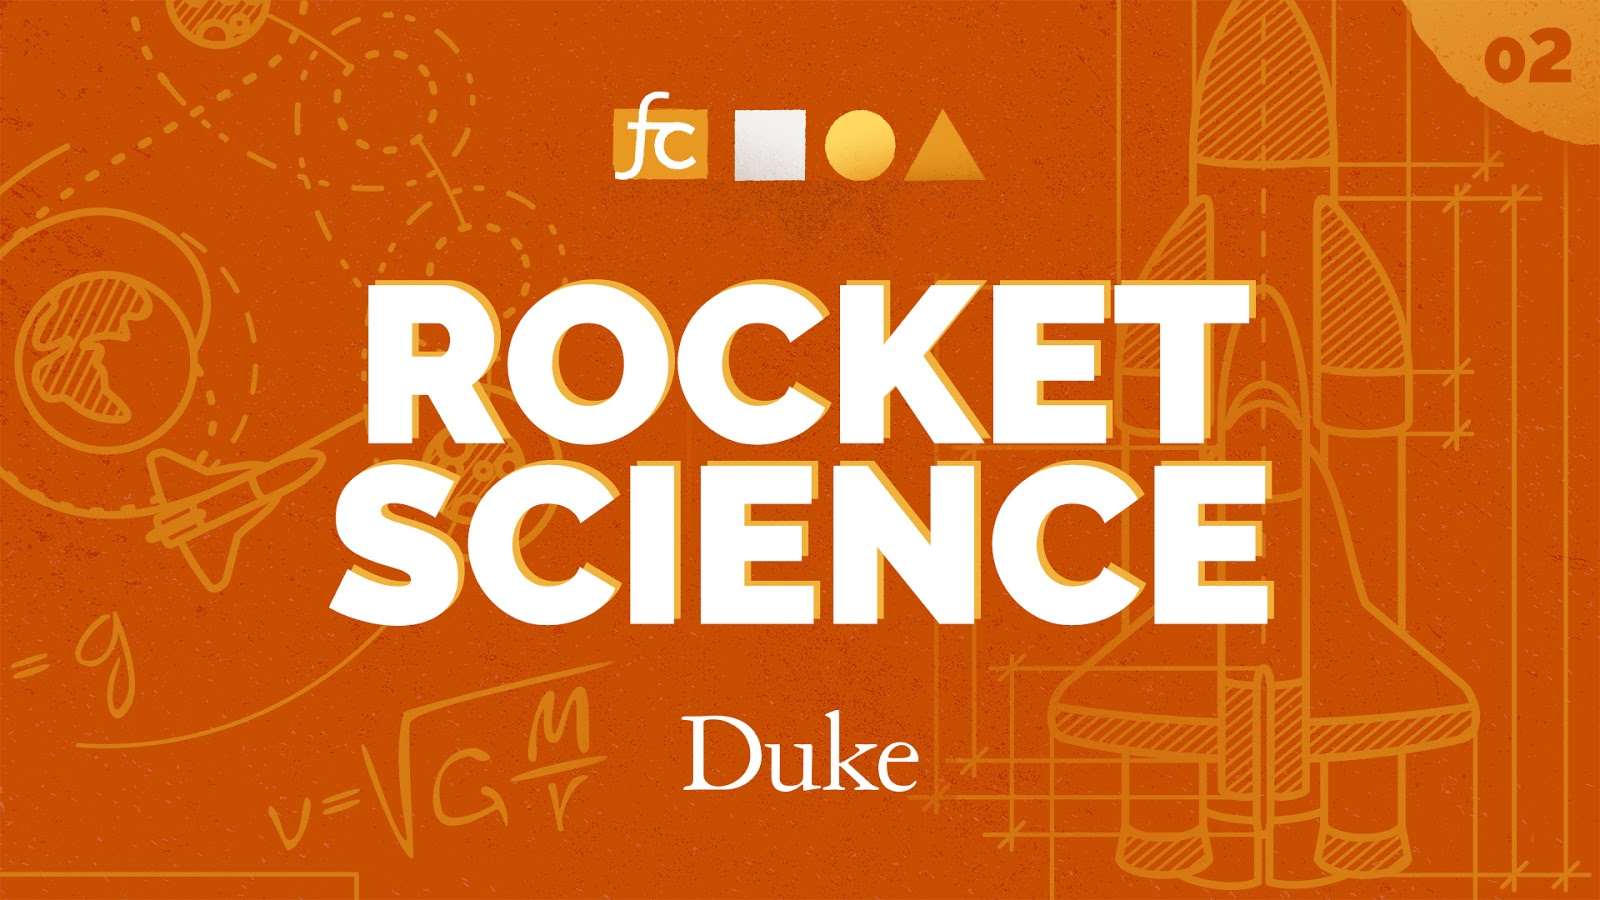 Duke Rocket Science YouTube thumbnail